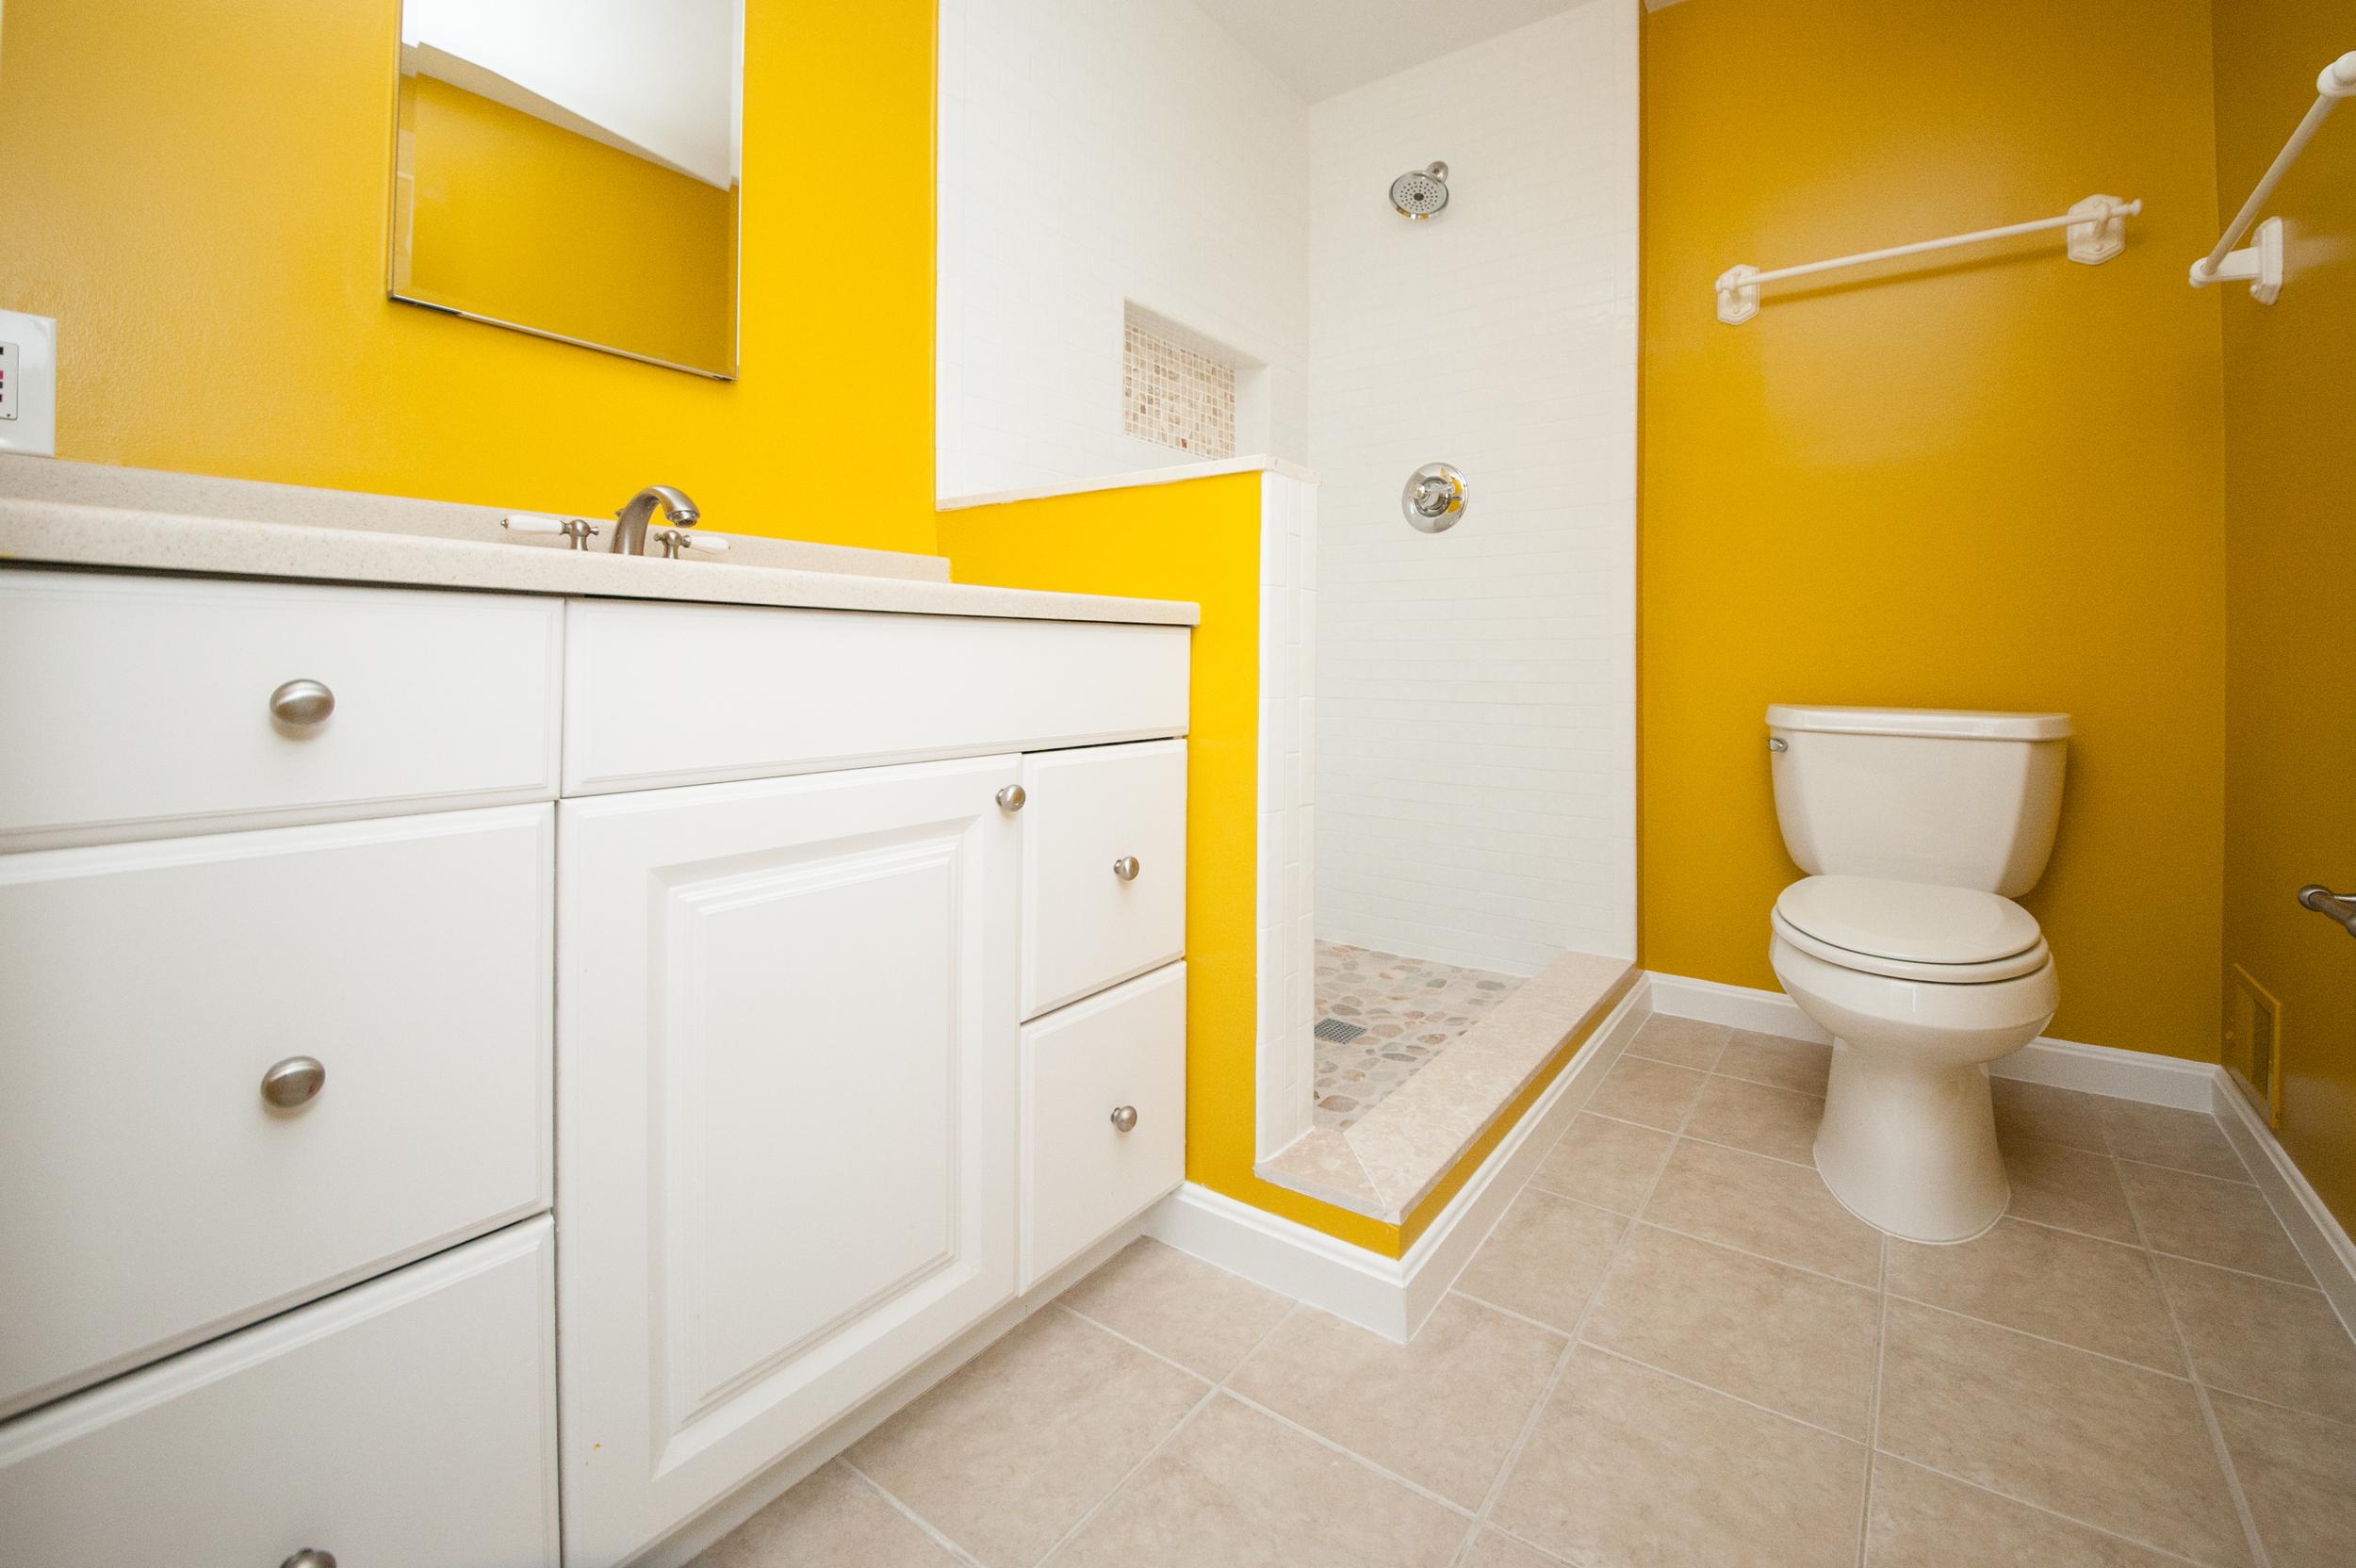 Bathroom renovation Baltimore, MD